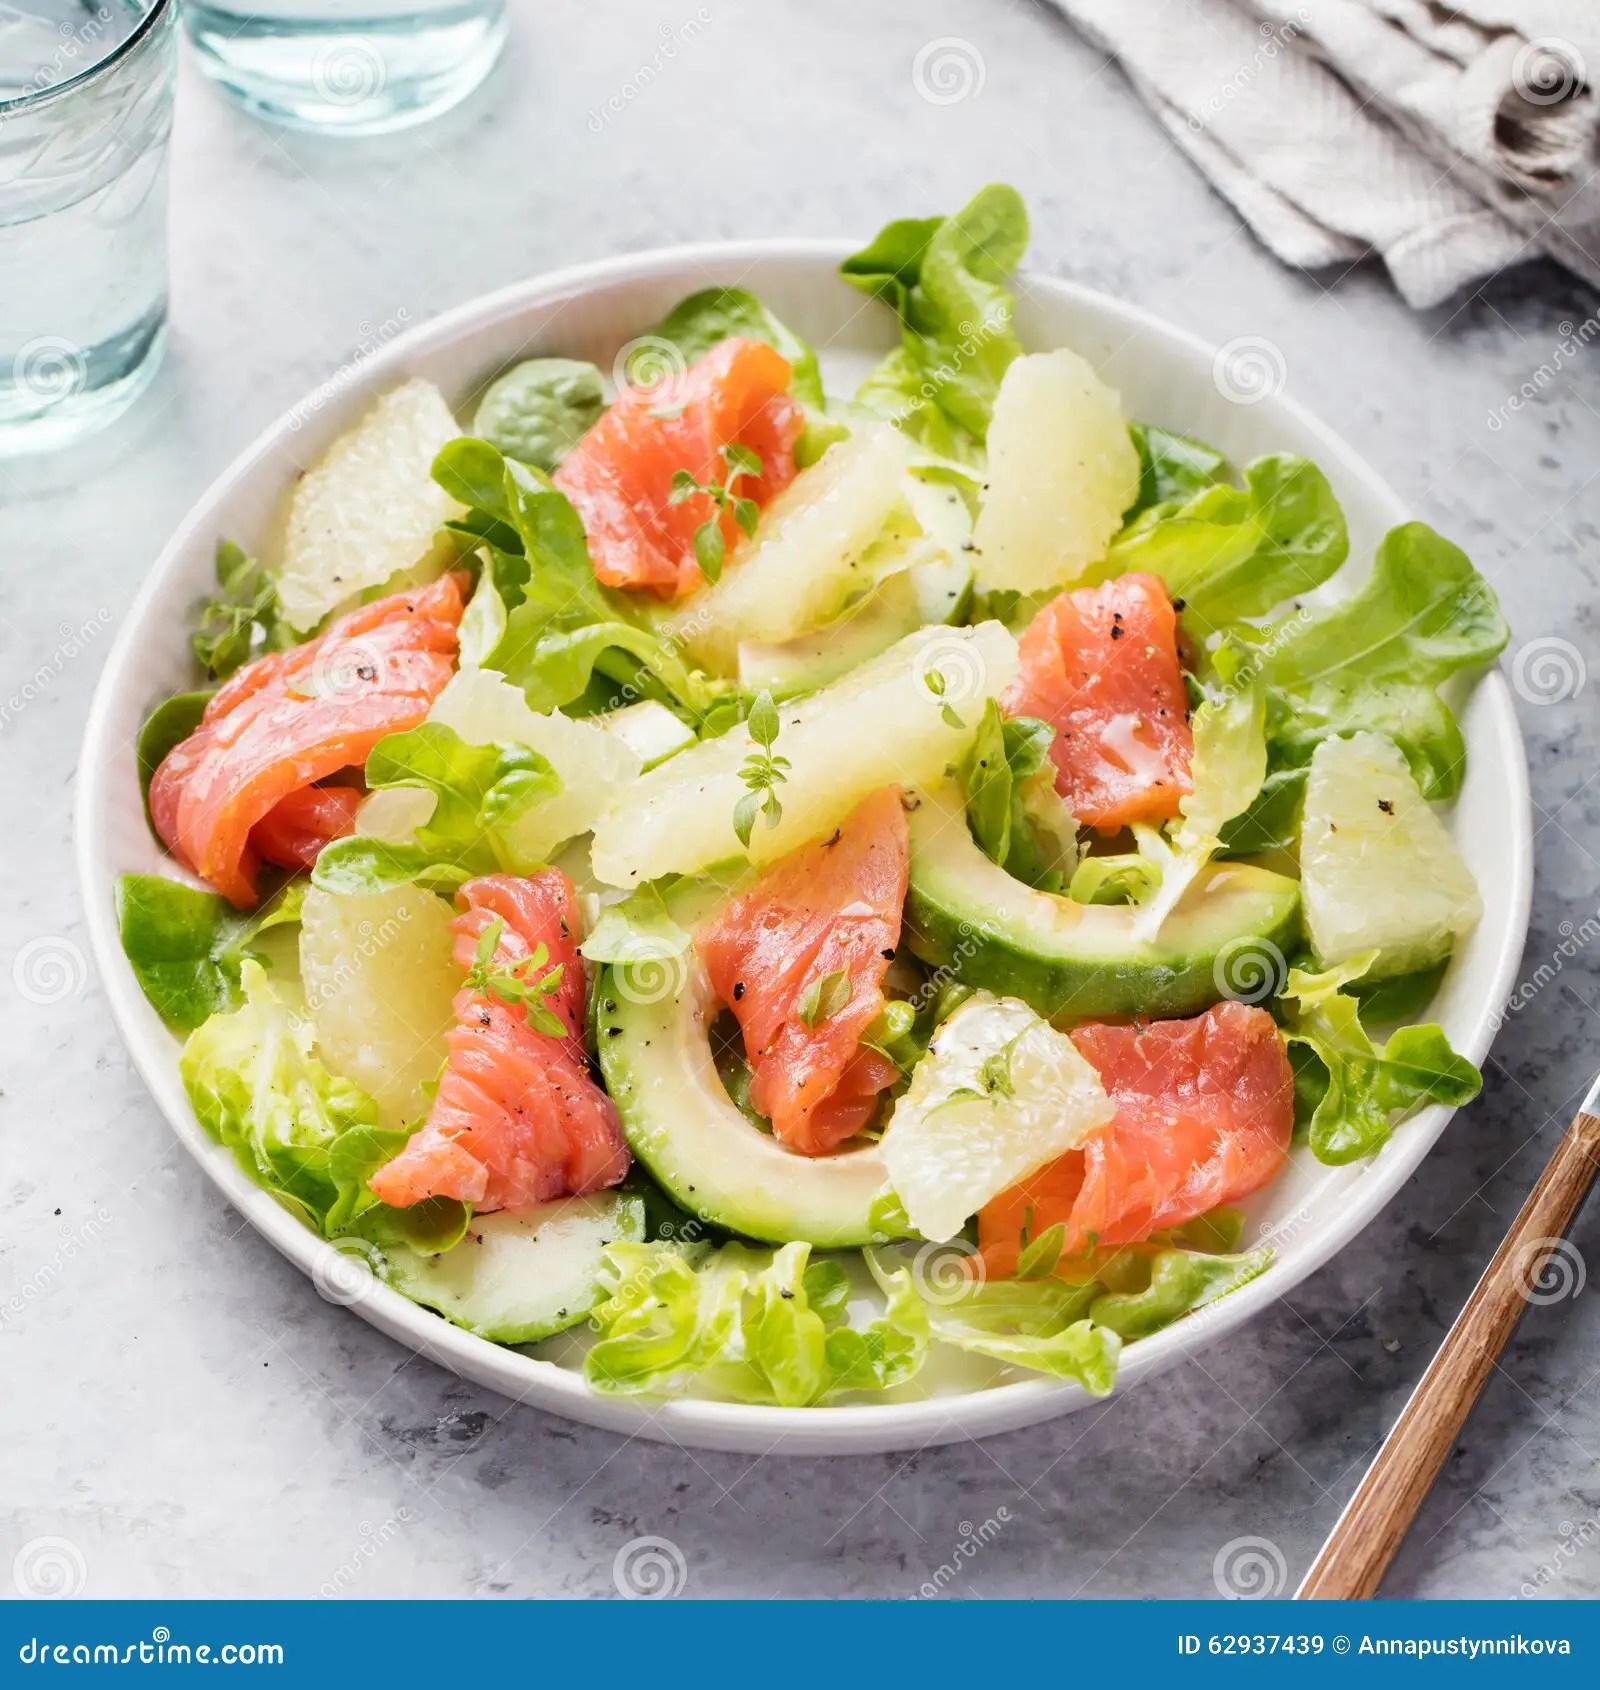 Eat Fresh Be Healthy Menu